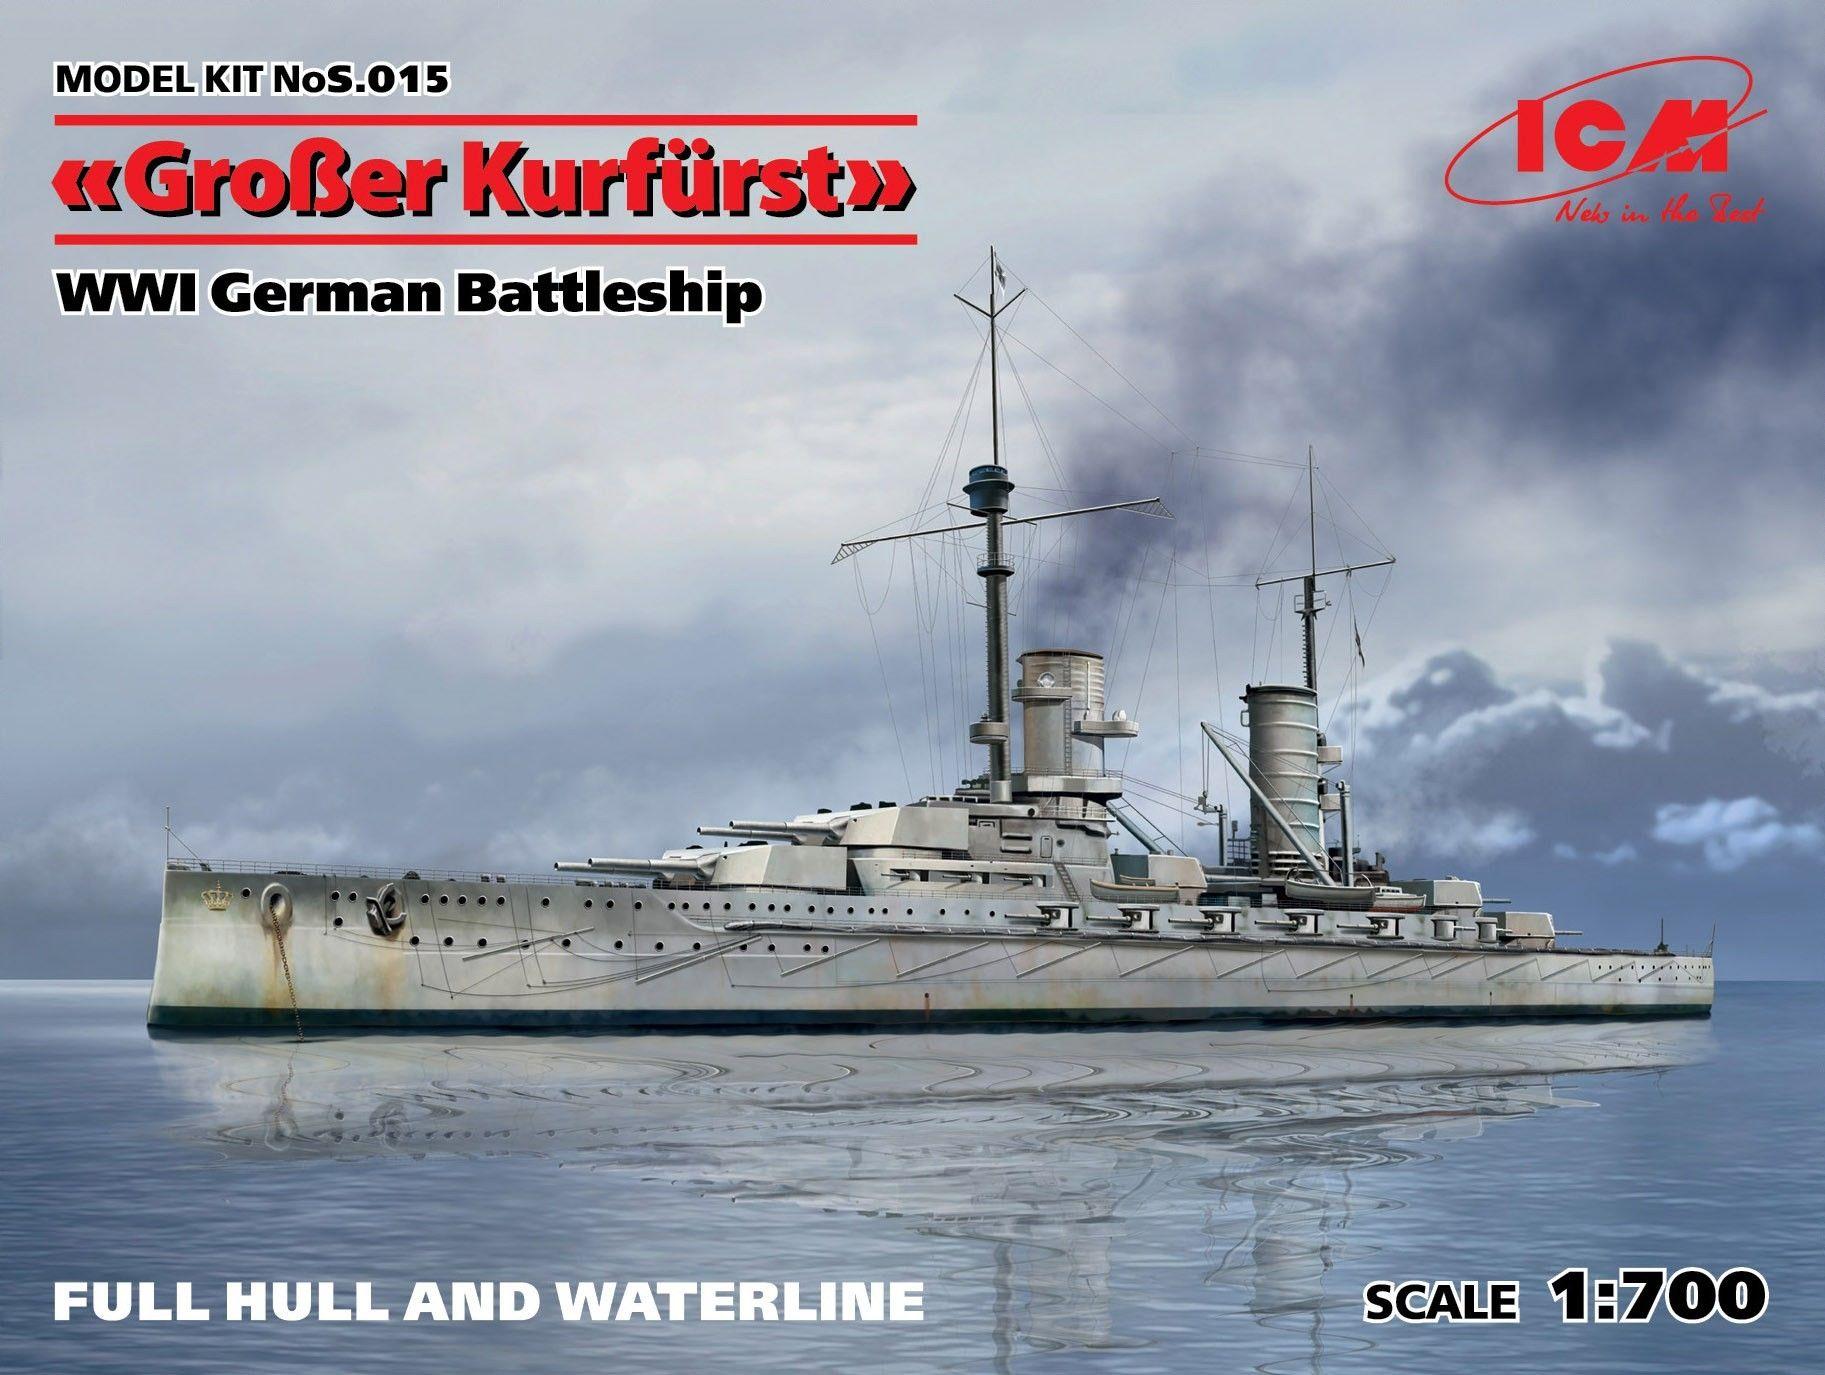 "Военен сглобяем модел - Германски имперски боен кораб ""Гросер Курфурст""-пълен корпус и ватерлиния (German Battleship ""Grosser Kurfurst"", full hull & waterline, WWI) - 1"